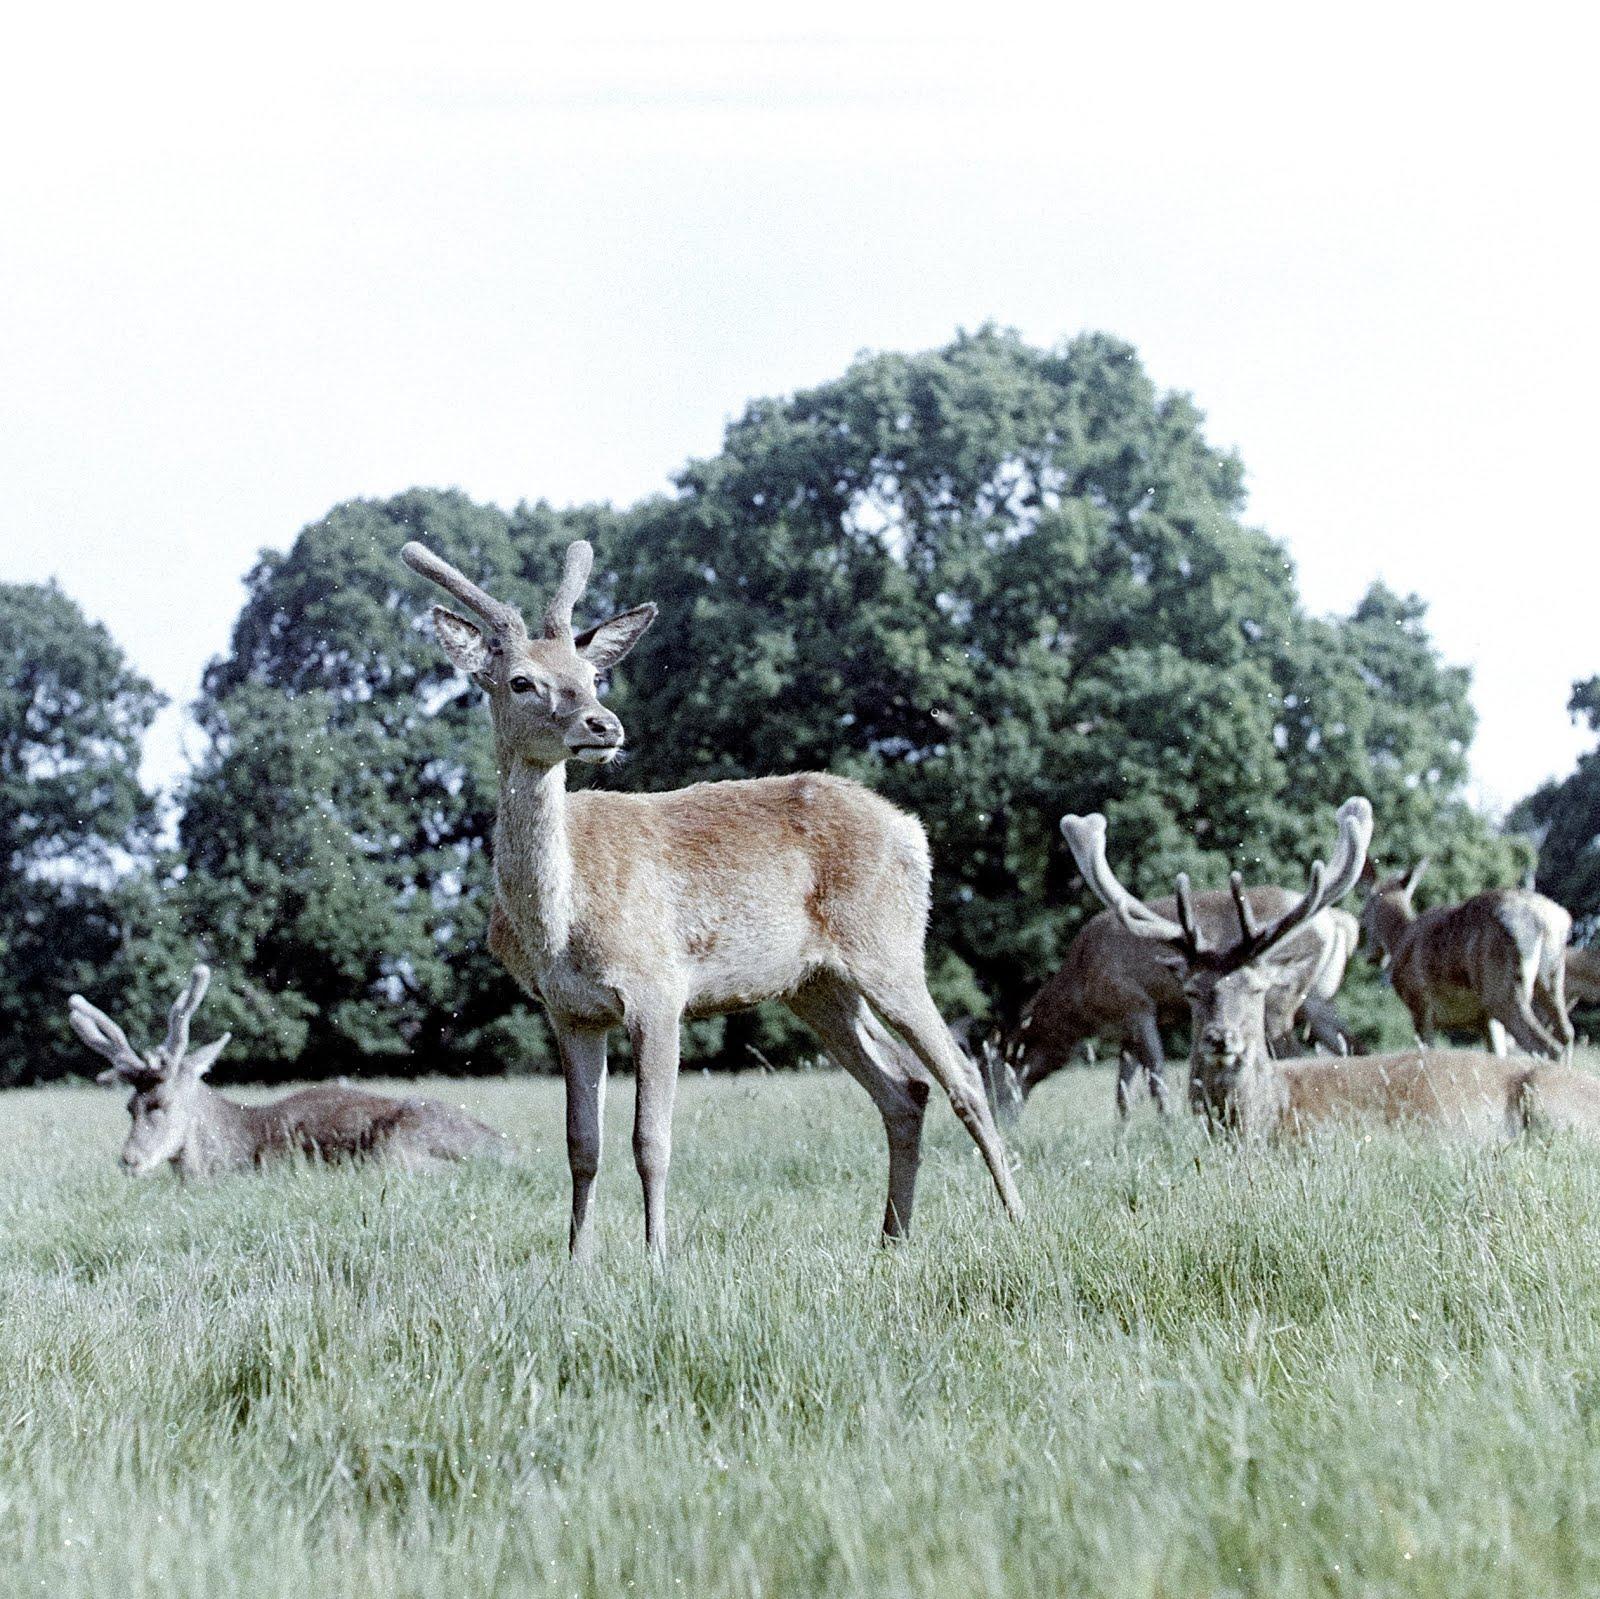 Wollaton Park deer taken with lomochrome metropolis 120